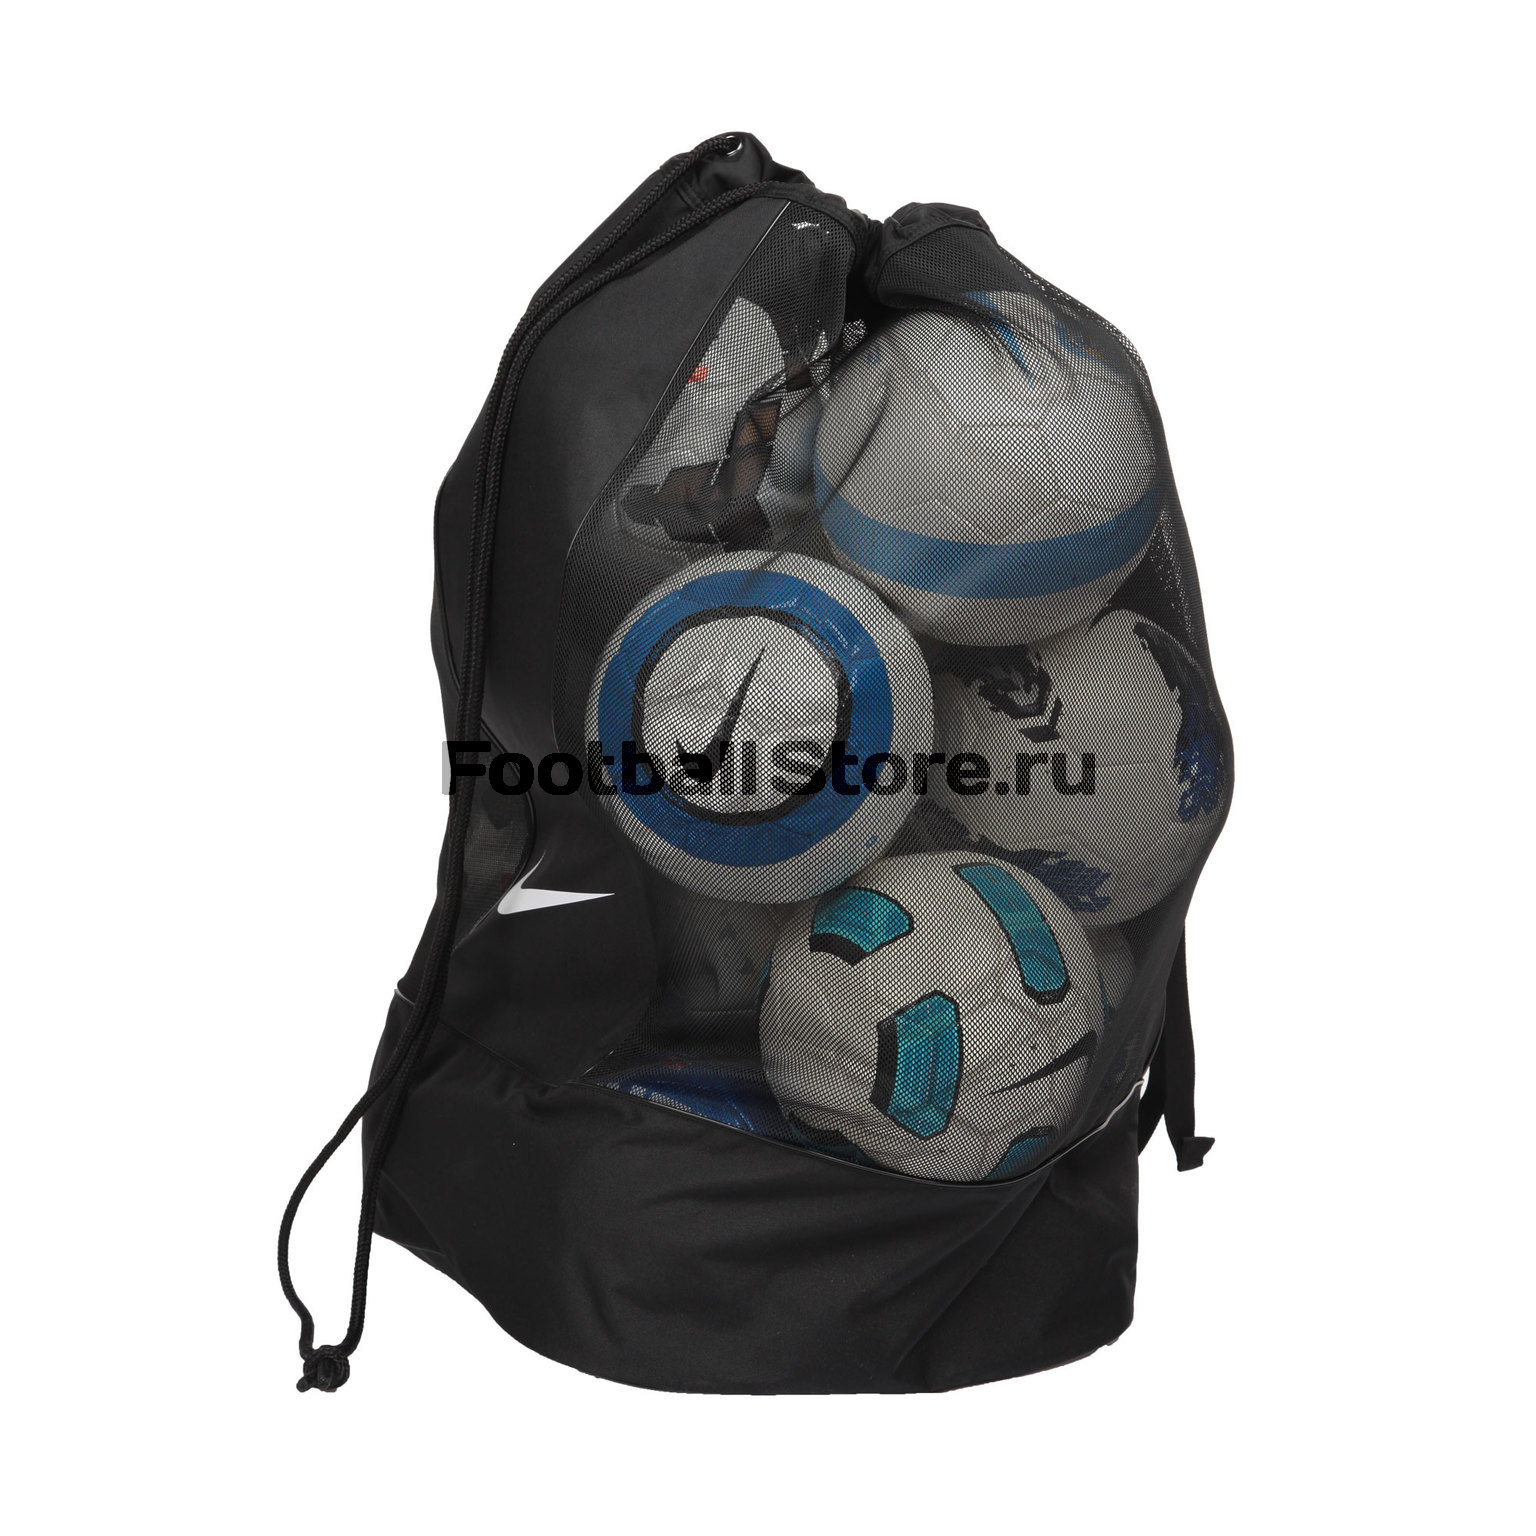 97fe8016 ... Сумка для мячей Nike Club Team Swoosh BA5200-010. О ТОВАРЕ; РАСЧЕТ  ДОСТАВКИ